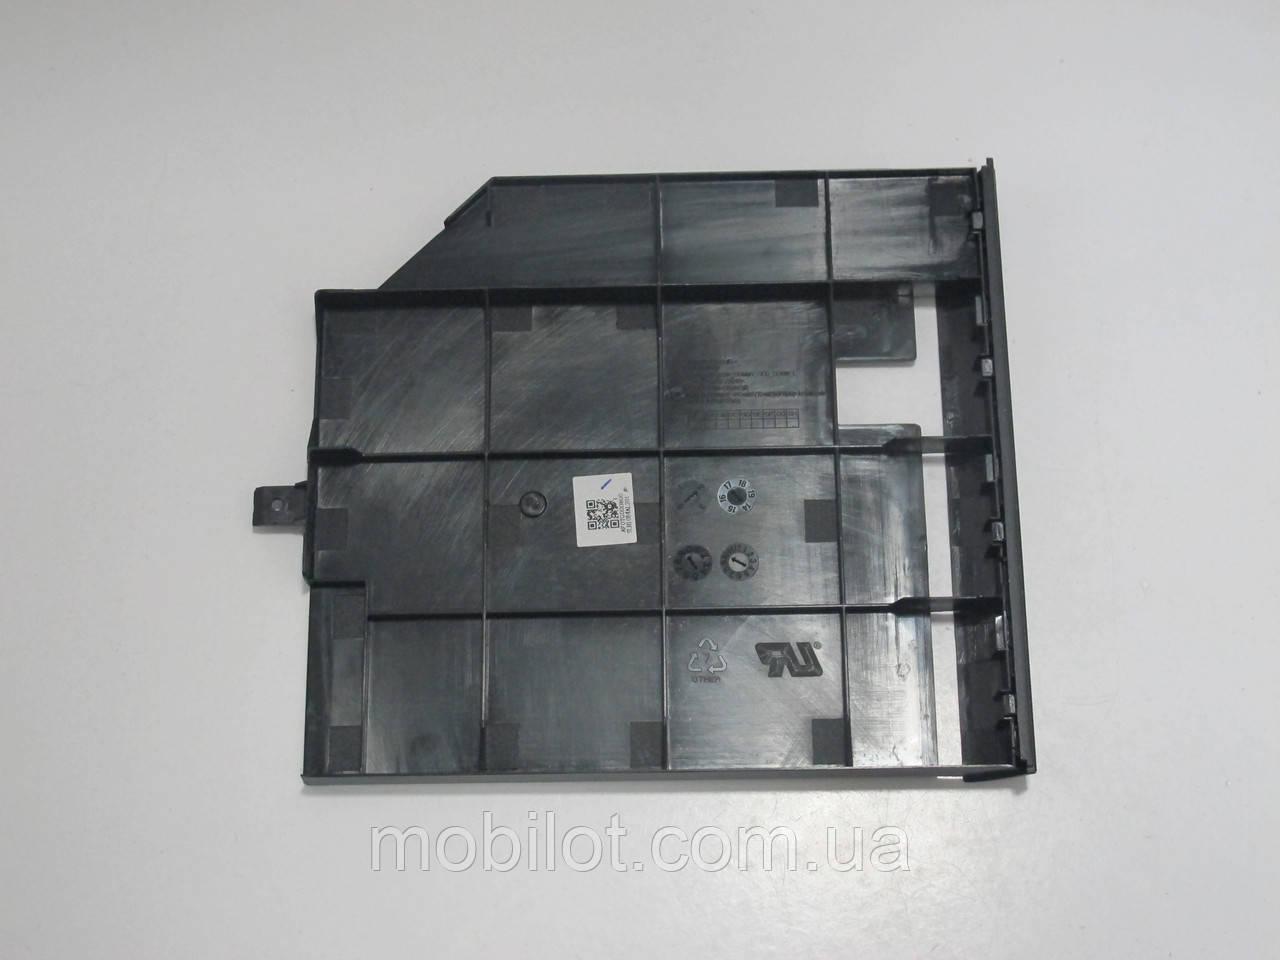 Корпус для привода Lenovo G50-30 (NZ-5225)